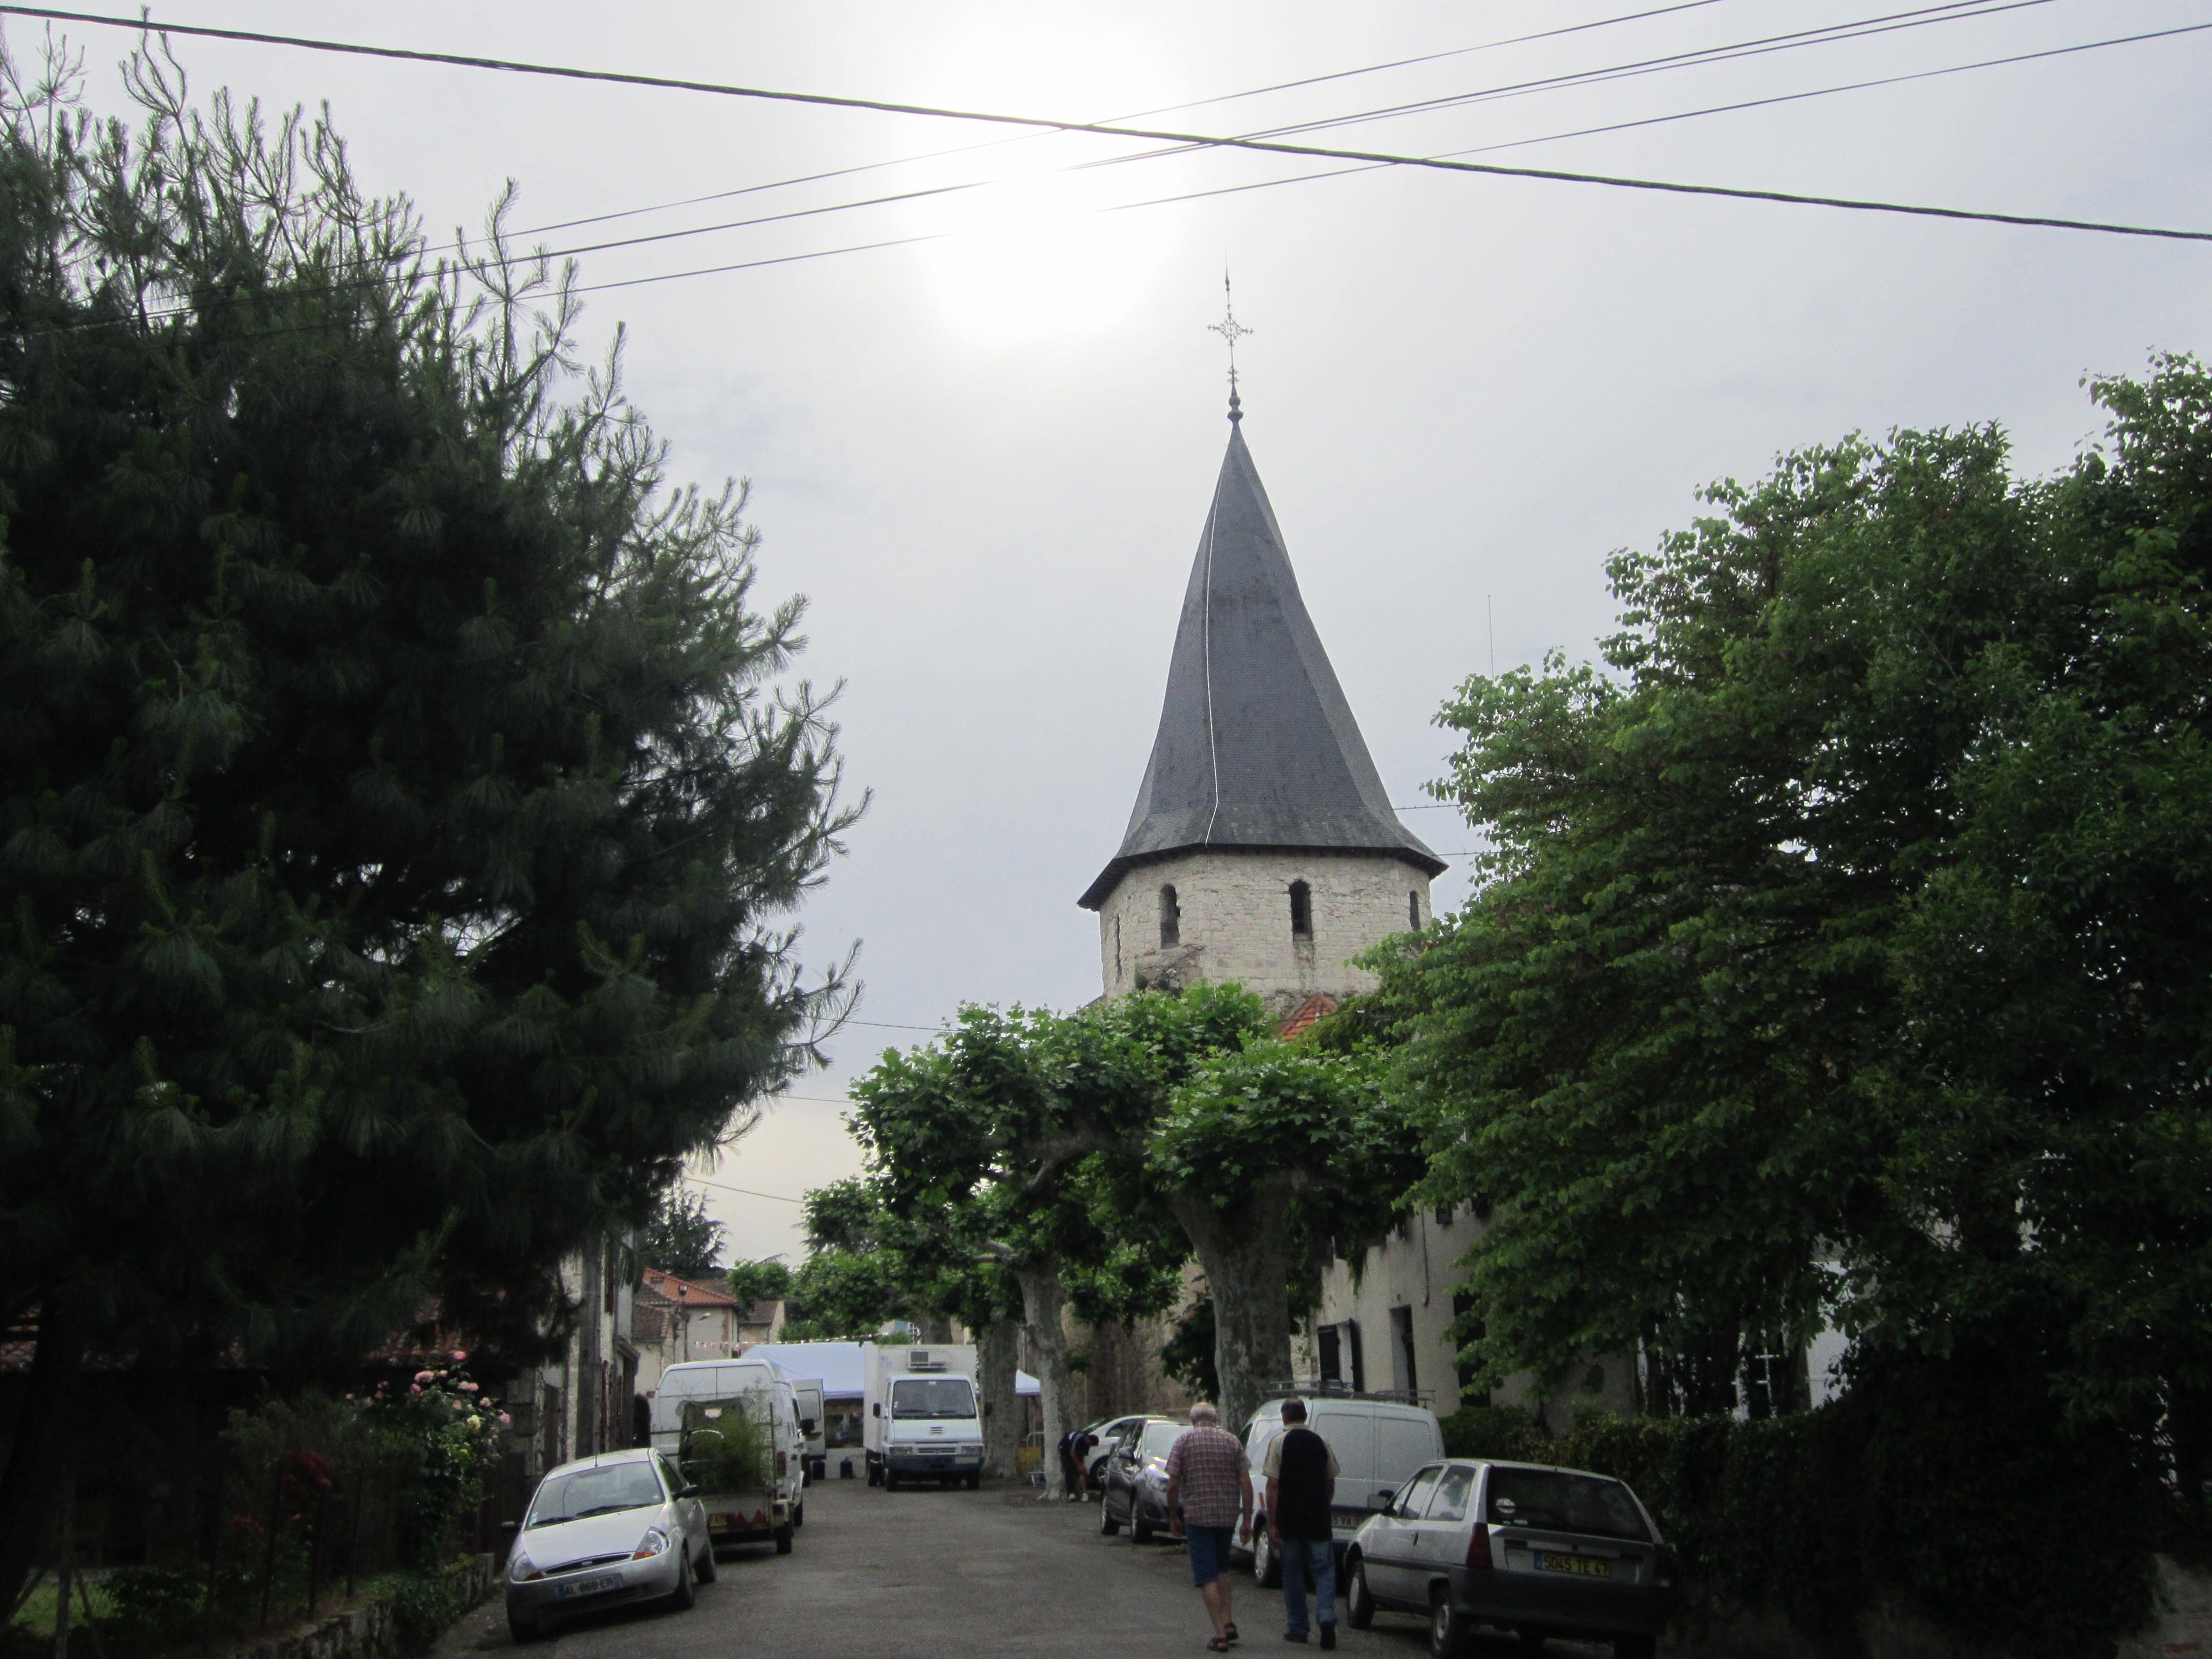 Sérignac sur Garonne   Lot-et-Garonne  France